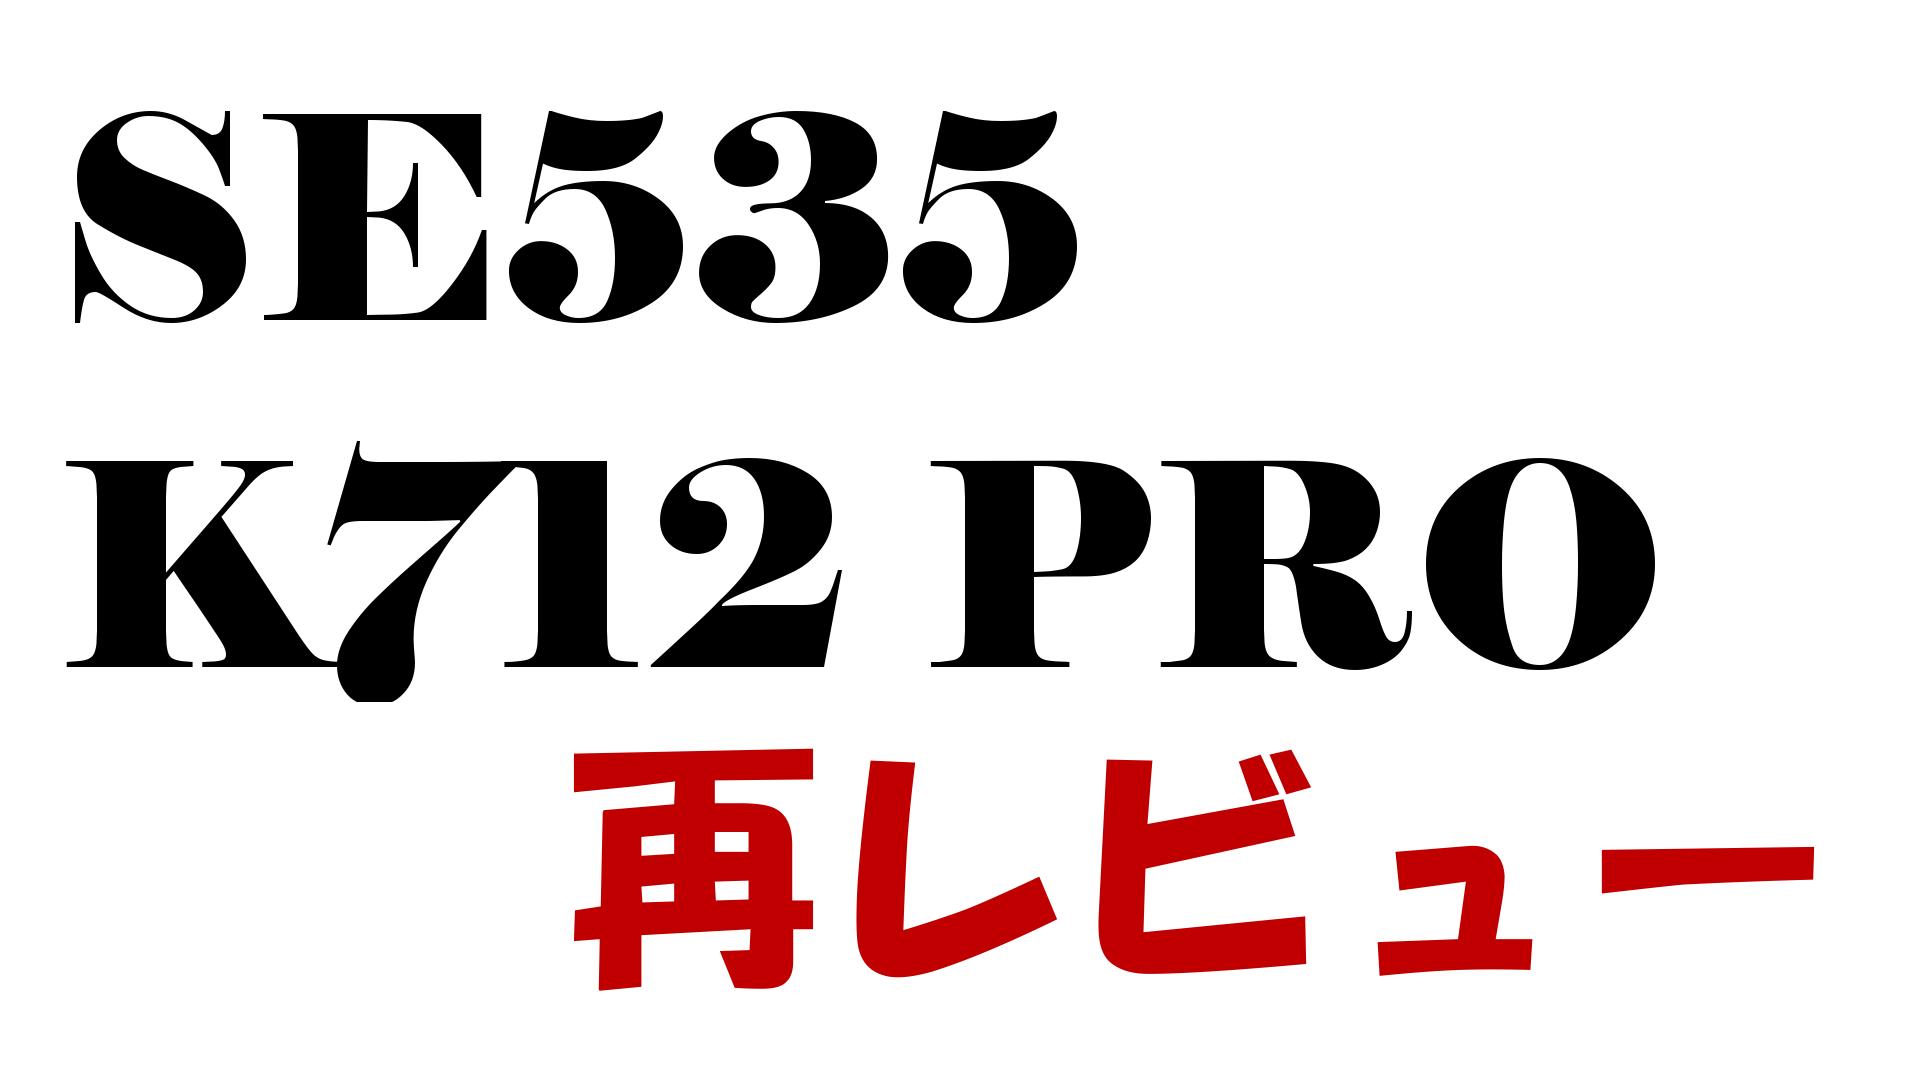 SE535 K712 PRO 再レビュー